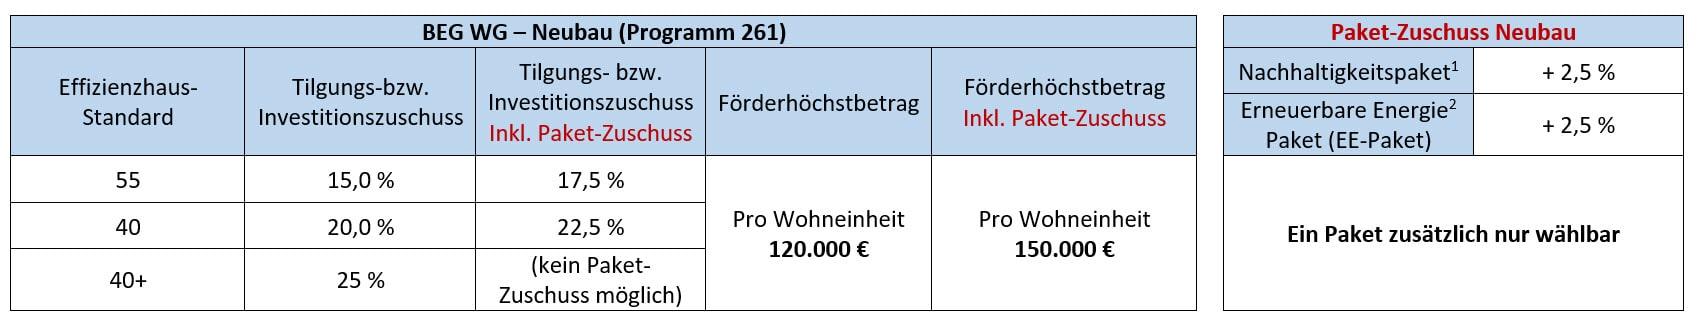 BEG WG – Neubau (Programm 261), Kaufering, Buchloe, Landsberg am Lech, Augsburg, Penzing, Igling